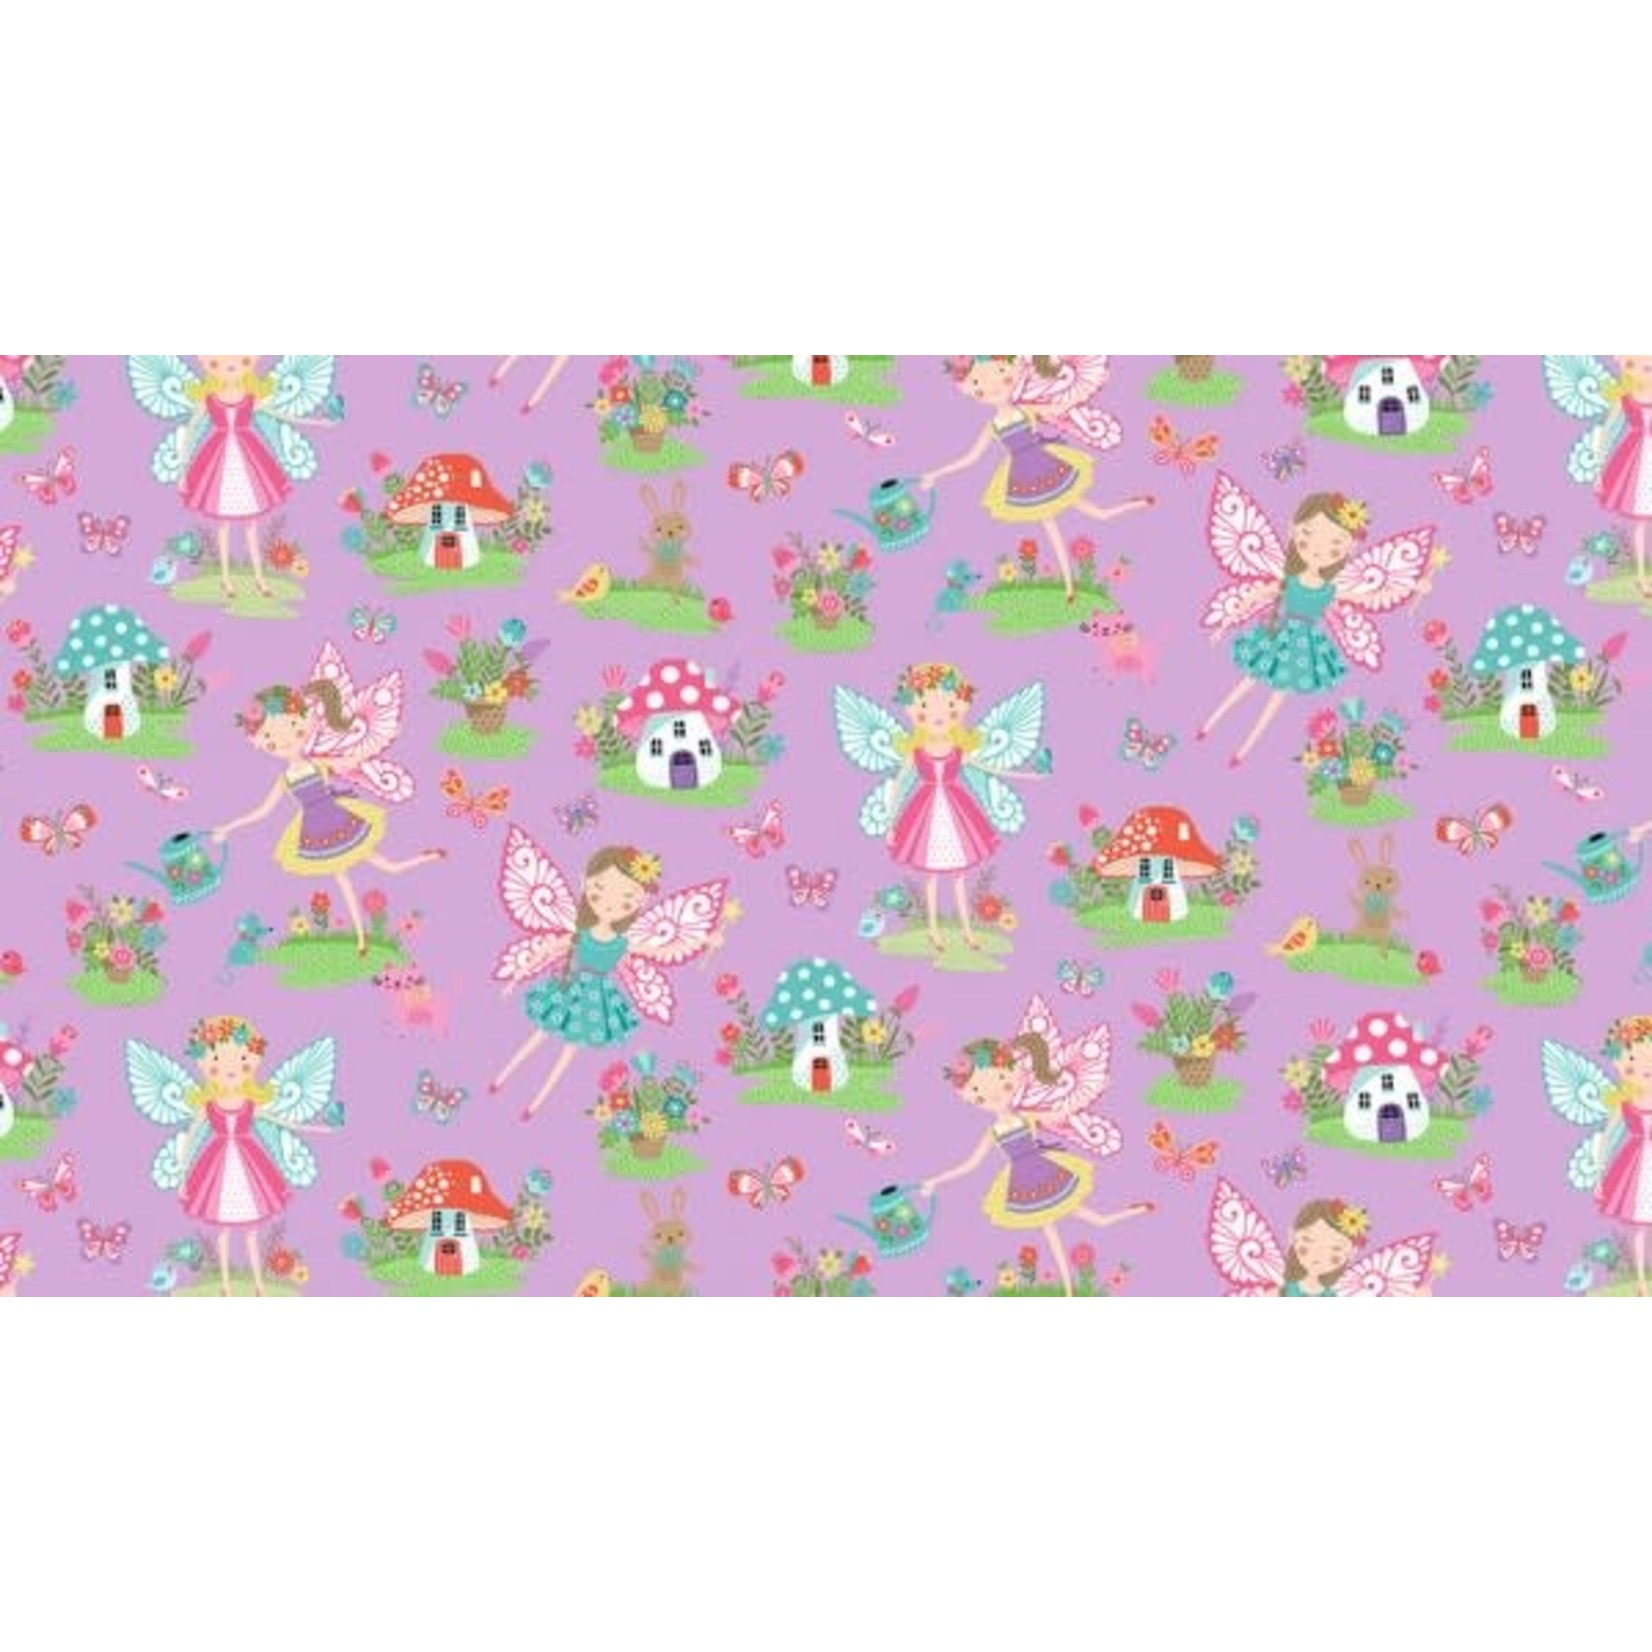 Makower UK DayDream - Fairies on Lilac -  PER CM OR $19/M